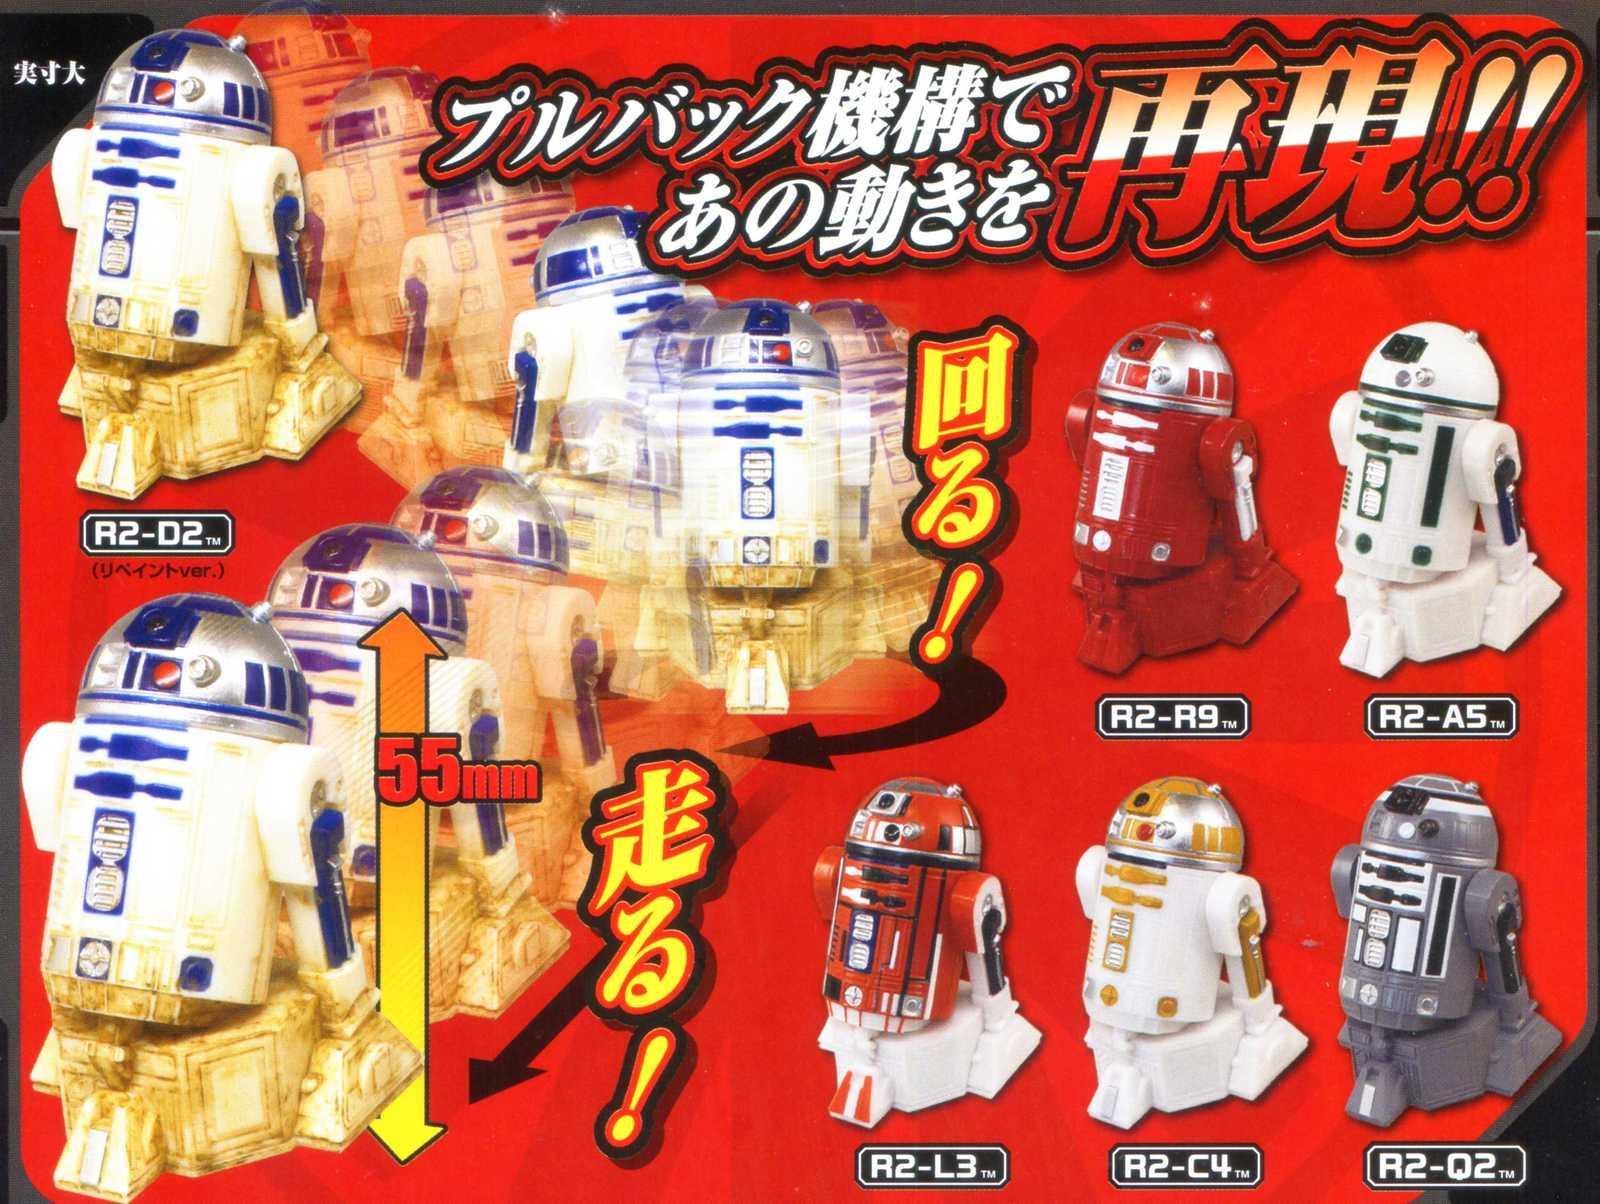 TAKARA TOMY ARTS STAR WARS Characters GACHA GALAXY PULLBACK DROID Phase 2 R2-Q2